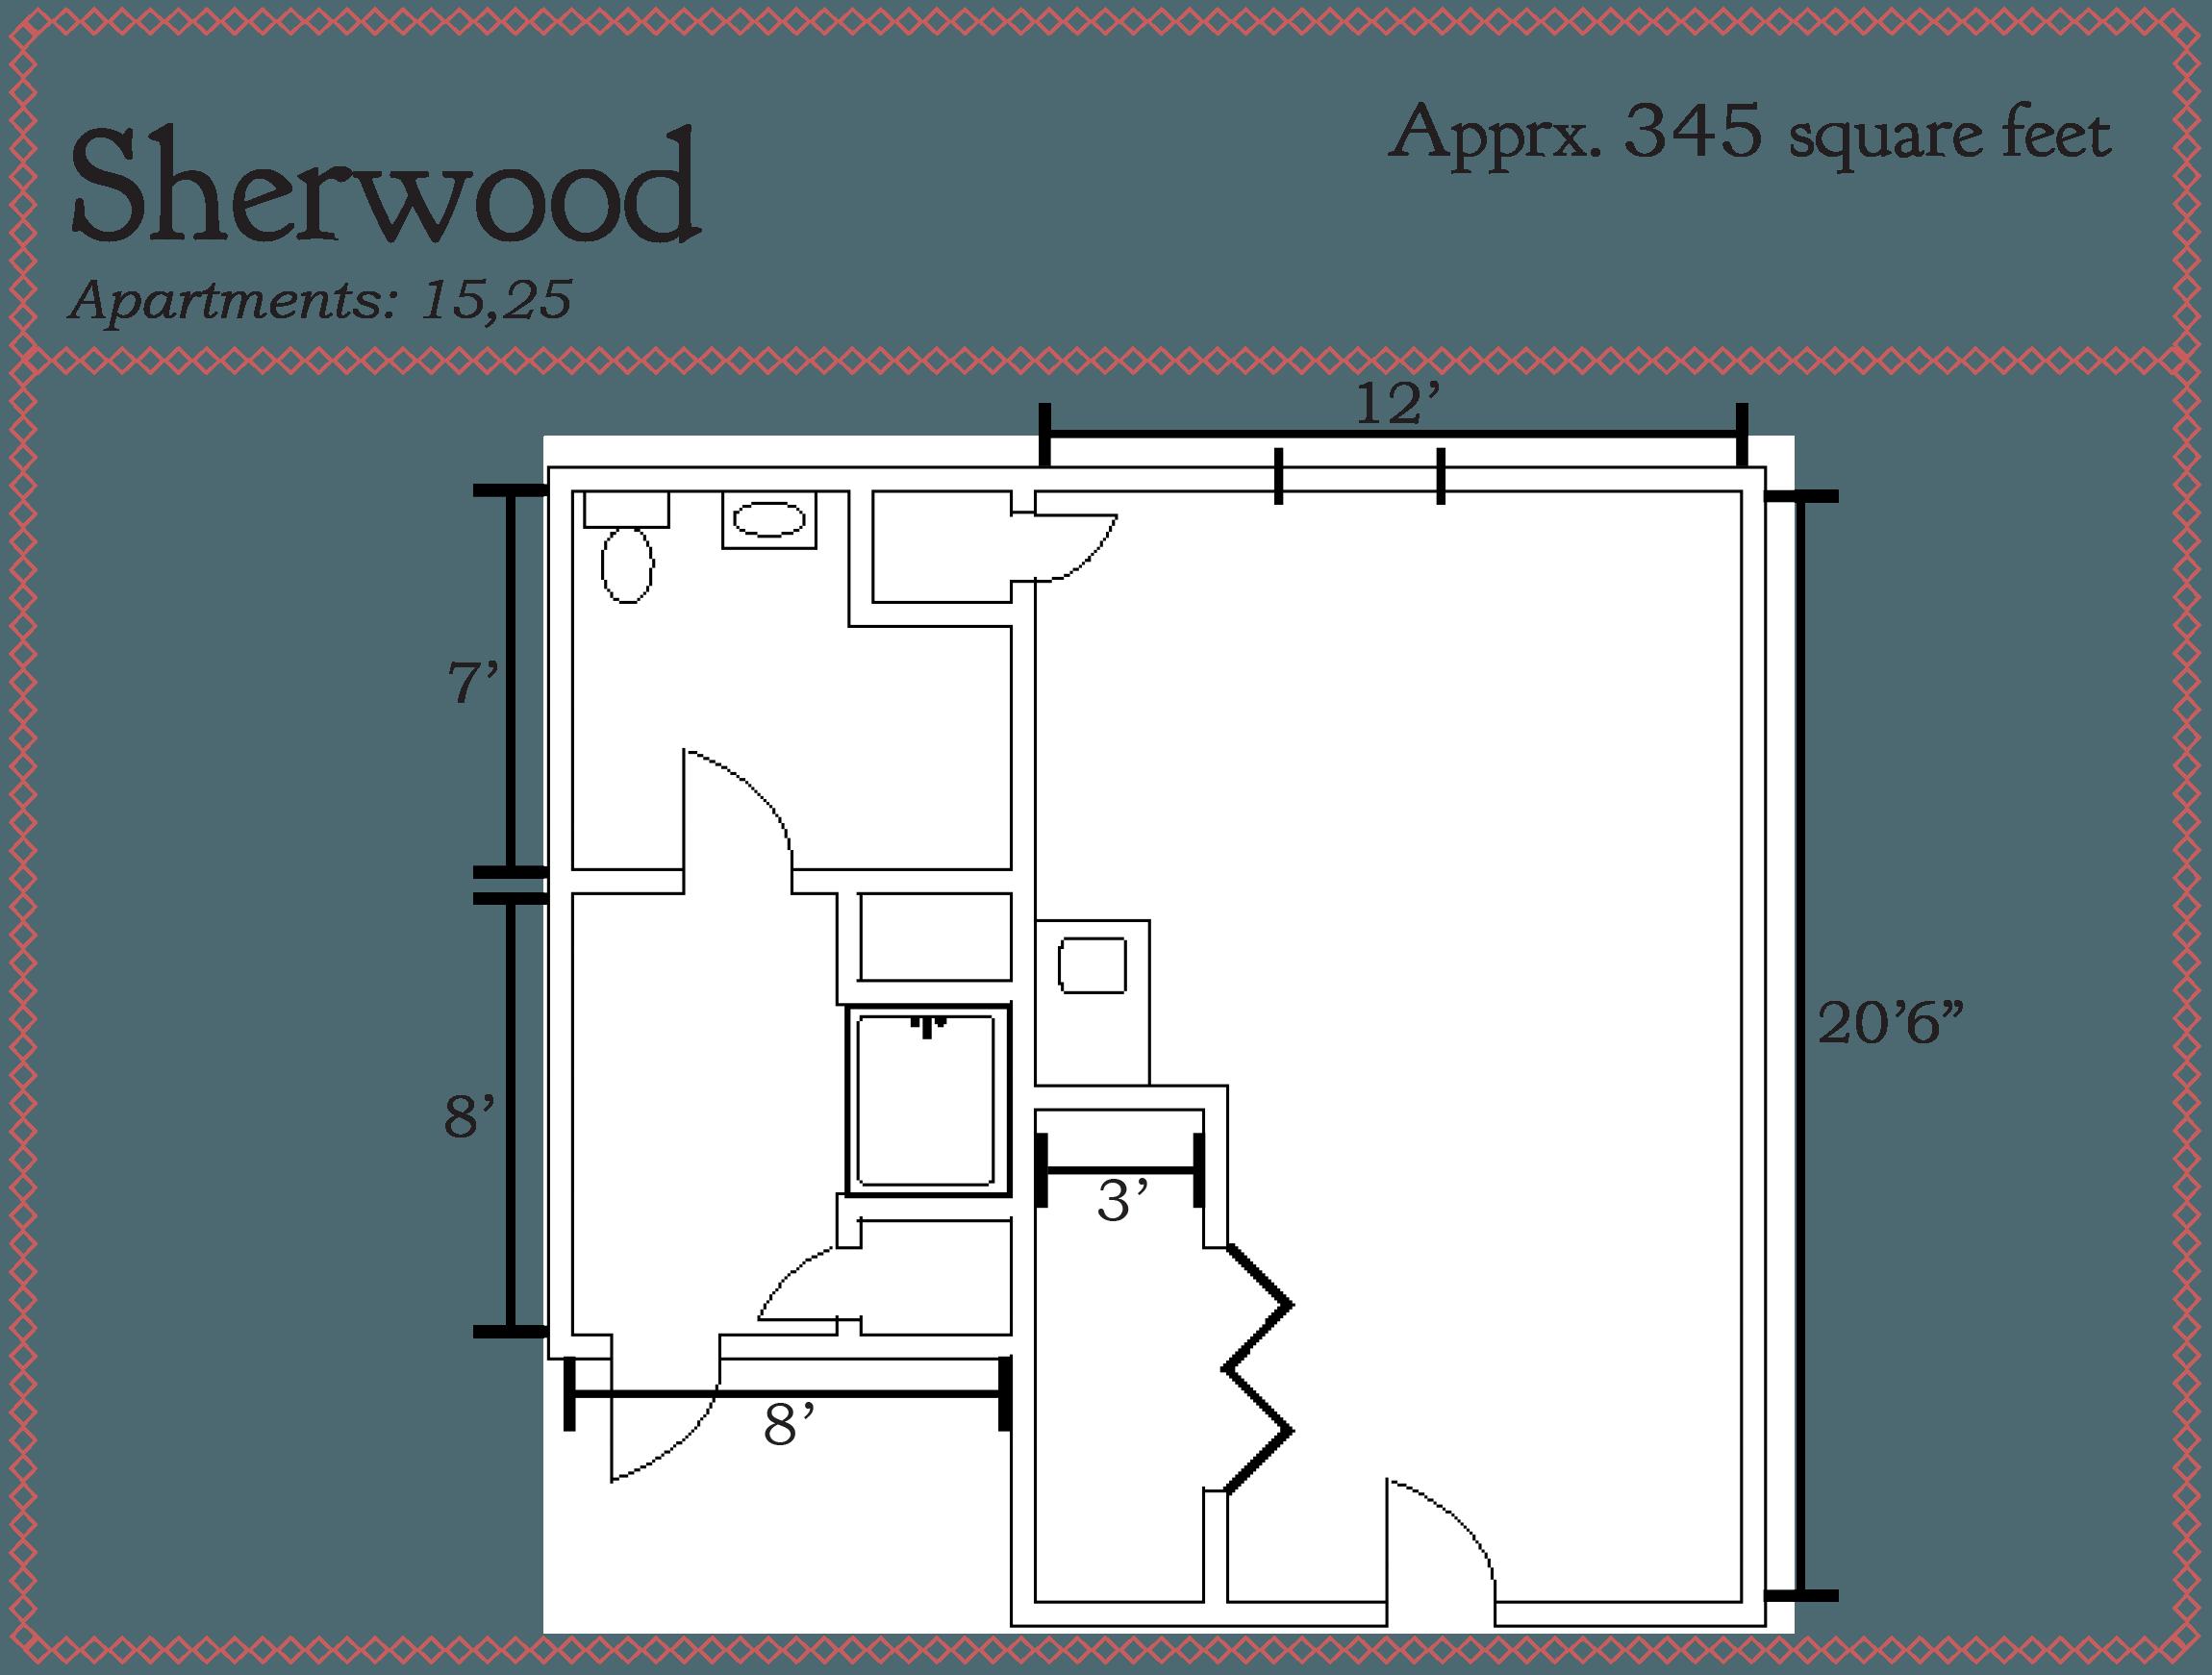 Sherwood